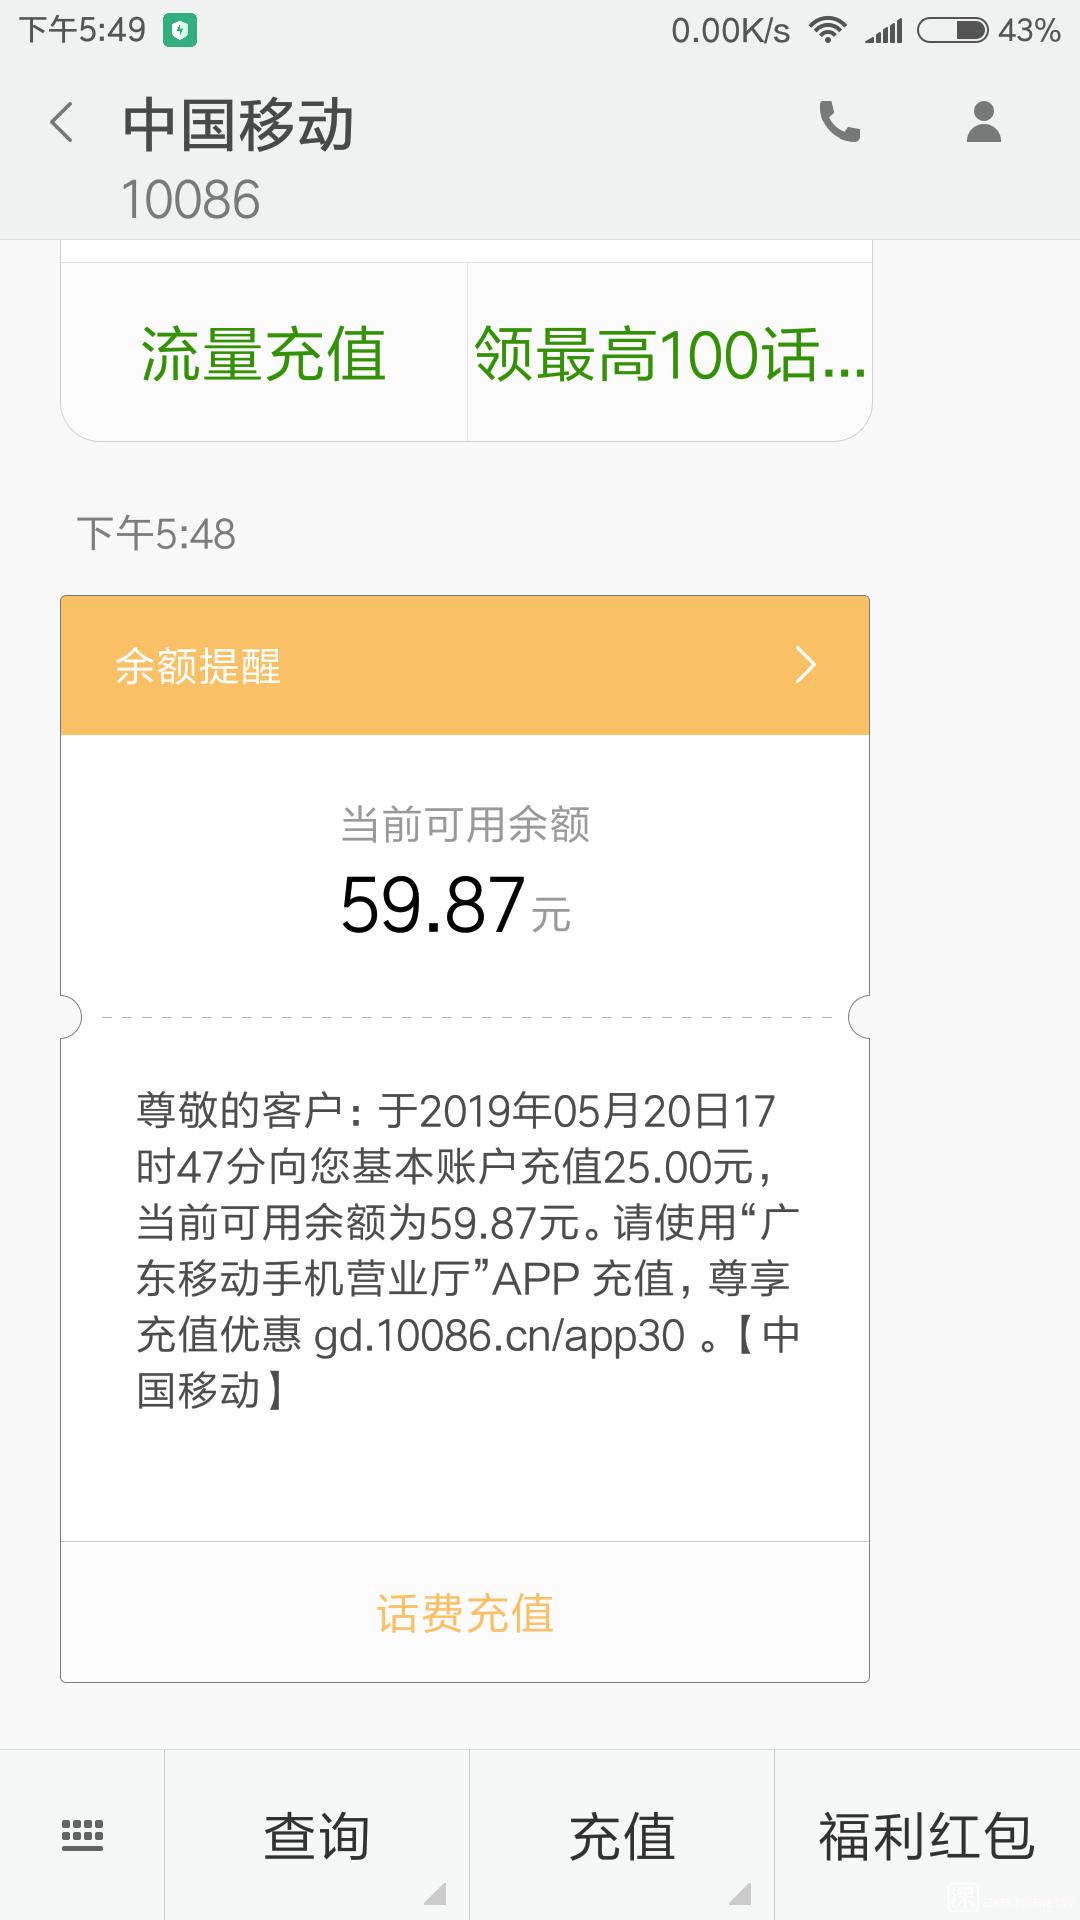 Screenshot_2019-05-20-17-49-34-513_com.android.mms.png